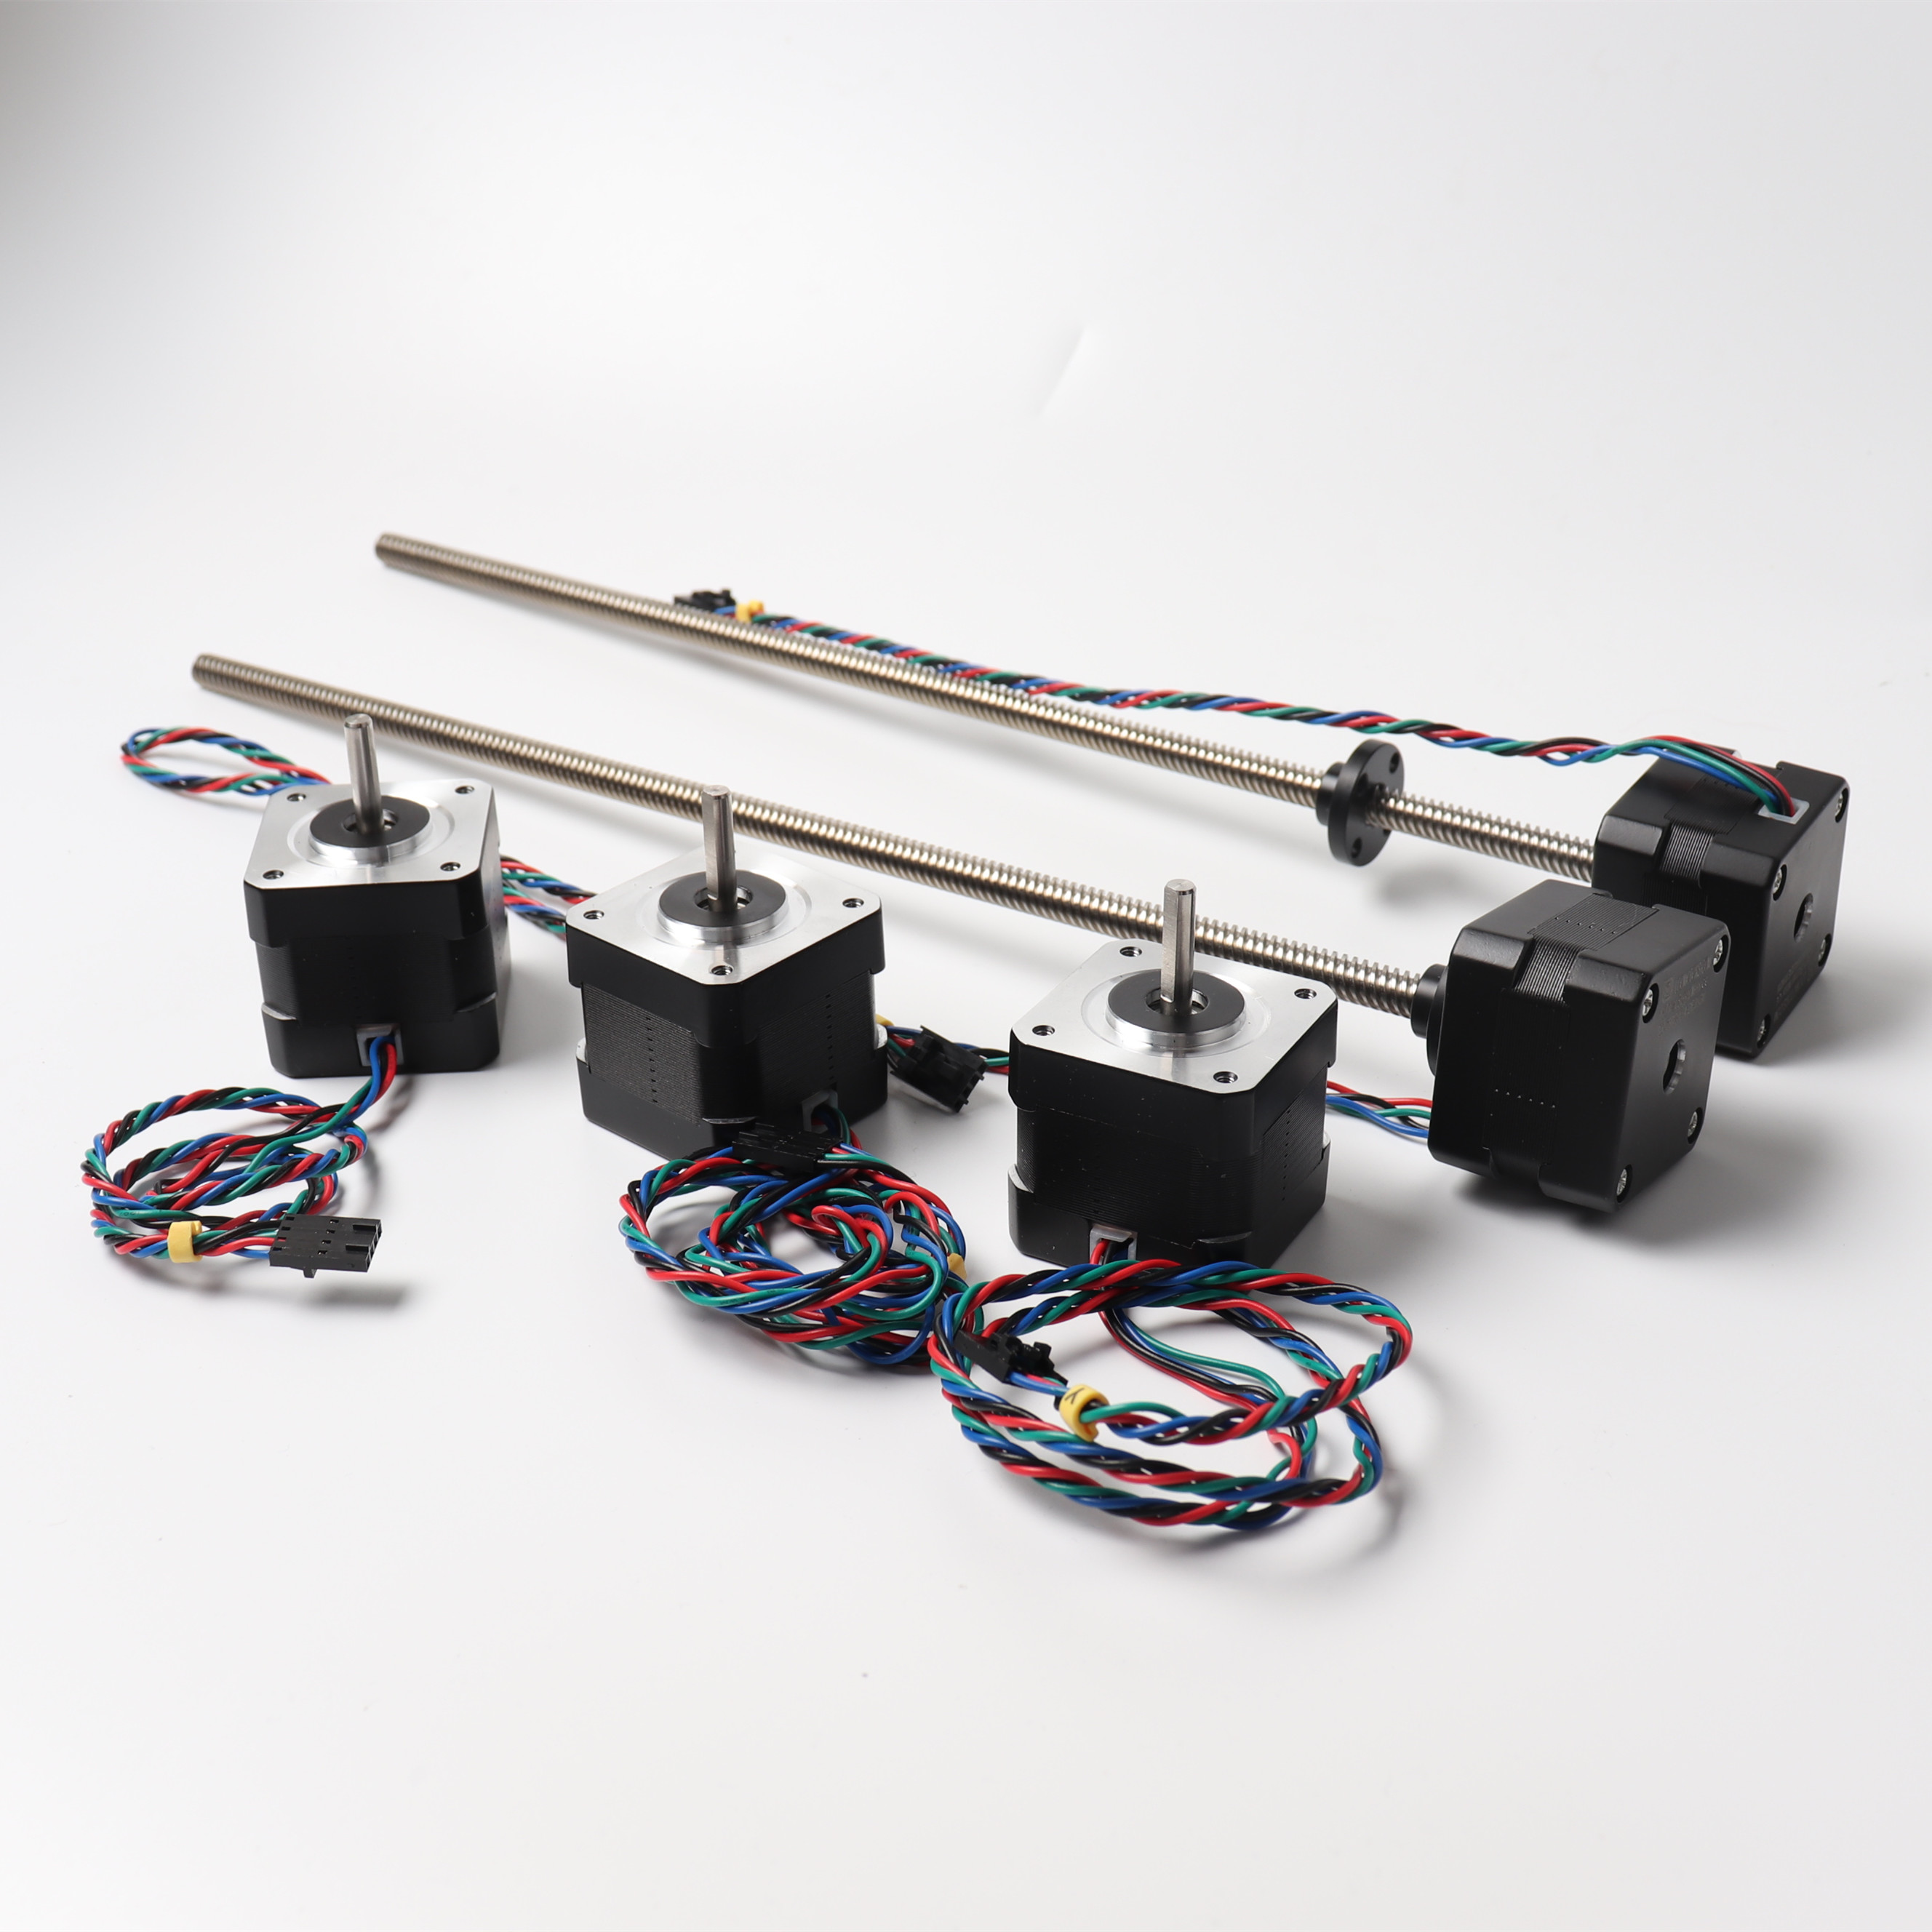 Original Prusa I3 MK2S/MK3/MK3S 3d Printer Motors Kit, Supplied By Original Manuafacturer.